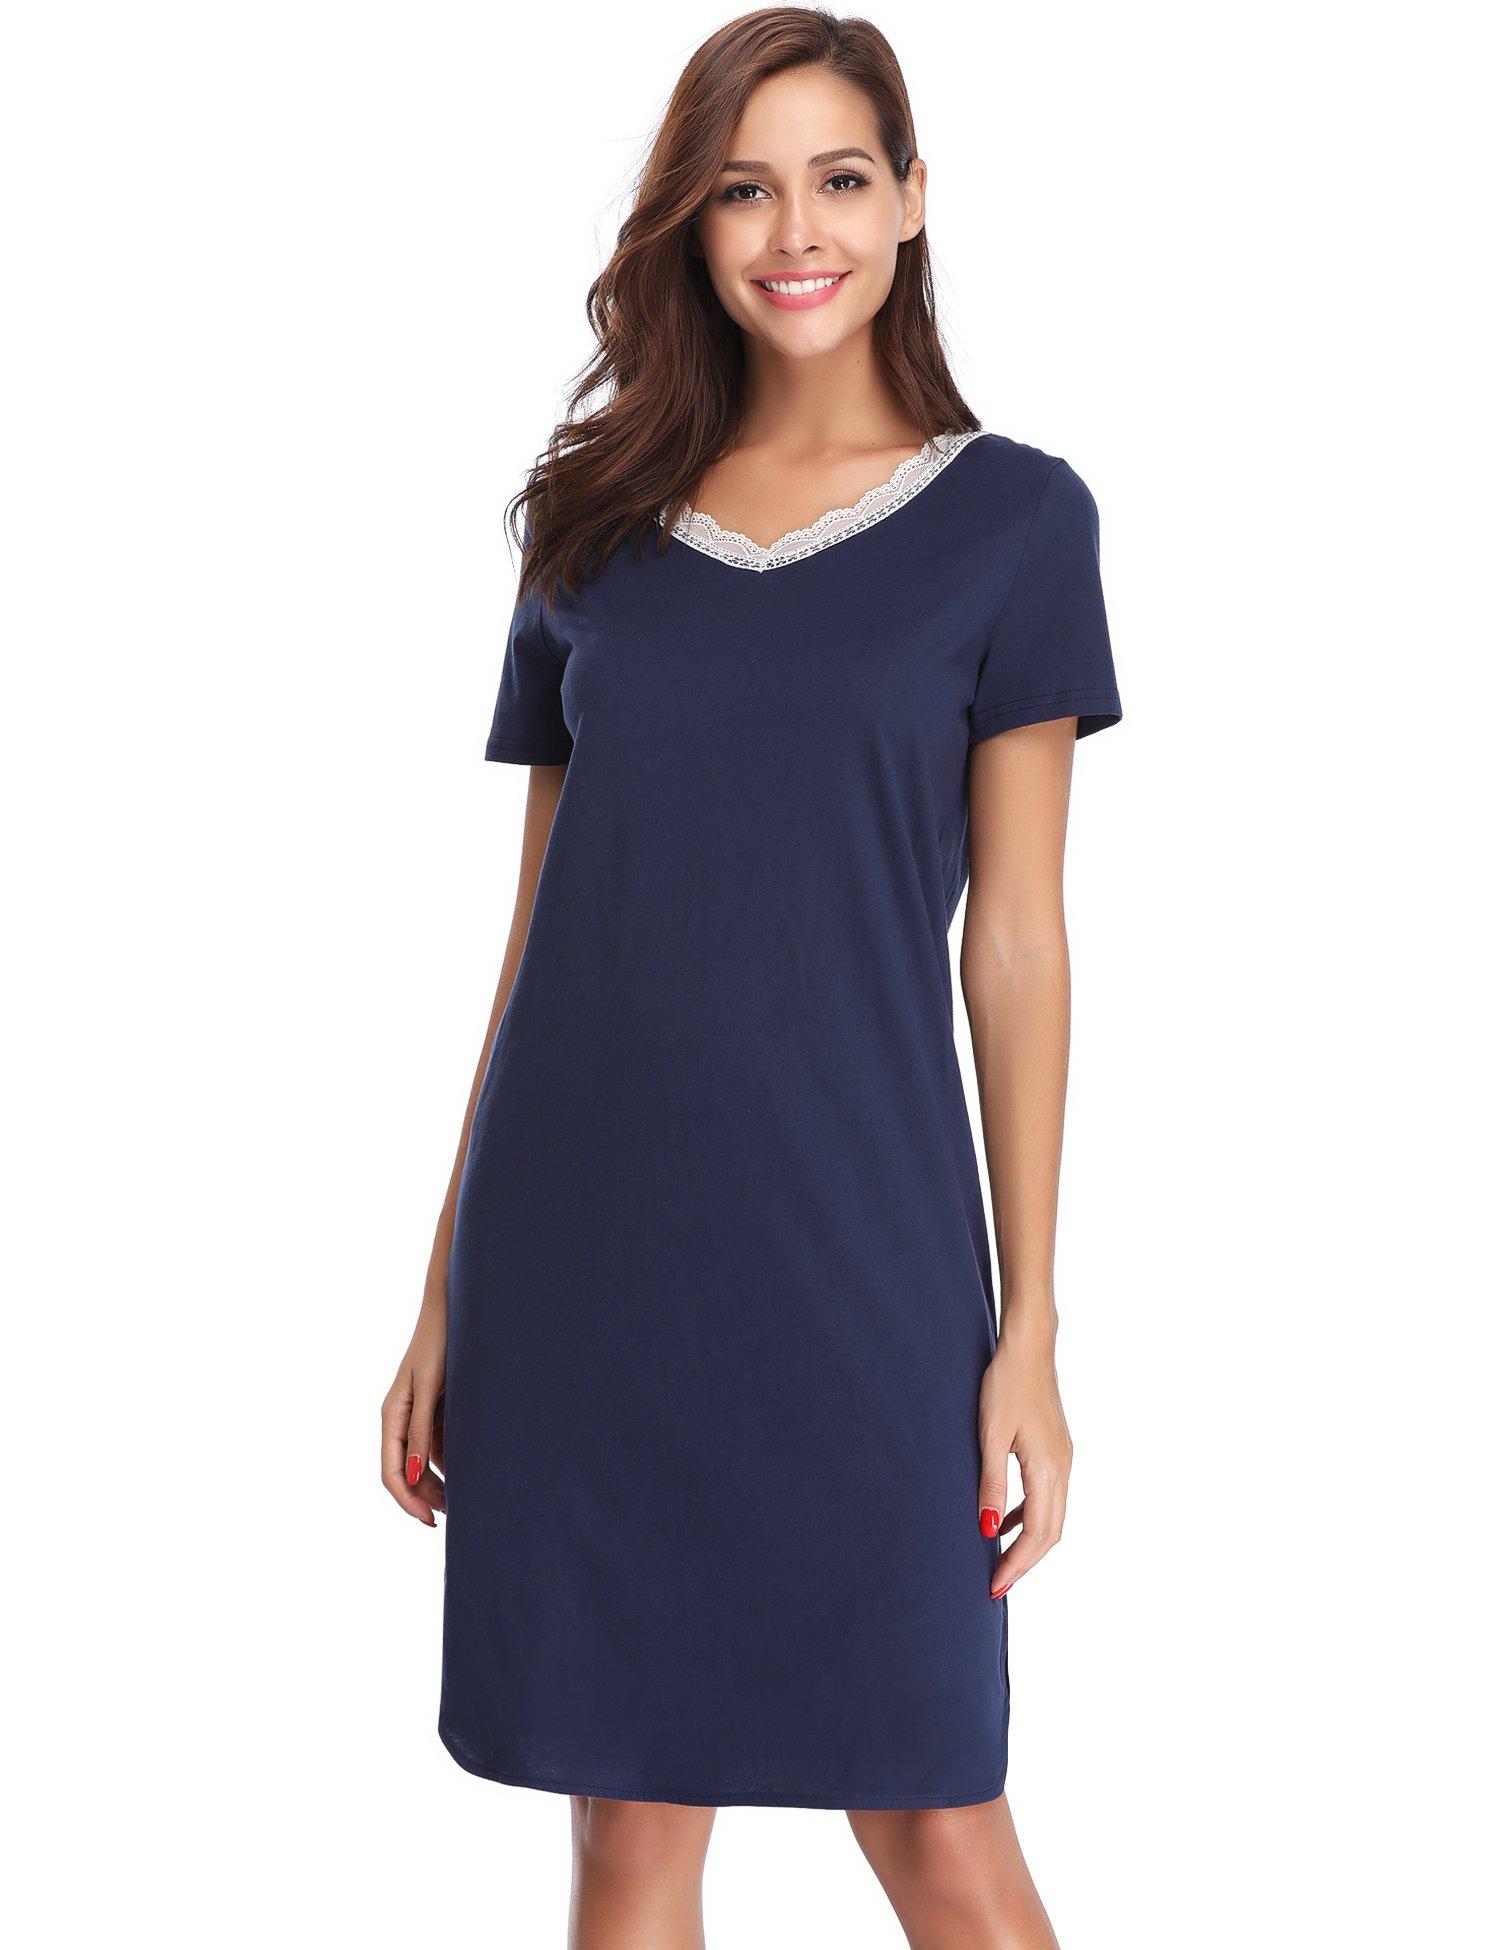 Hawiton Women's Short Sleeve Cotton V Neck Nightgown Sleep Dress Shirt